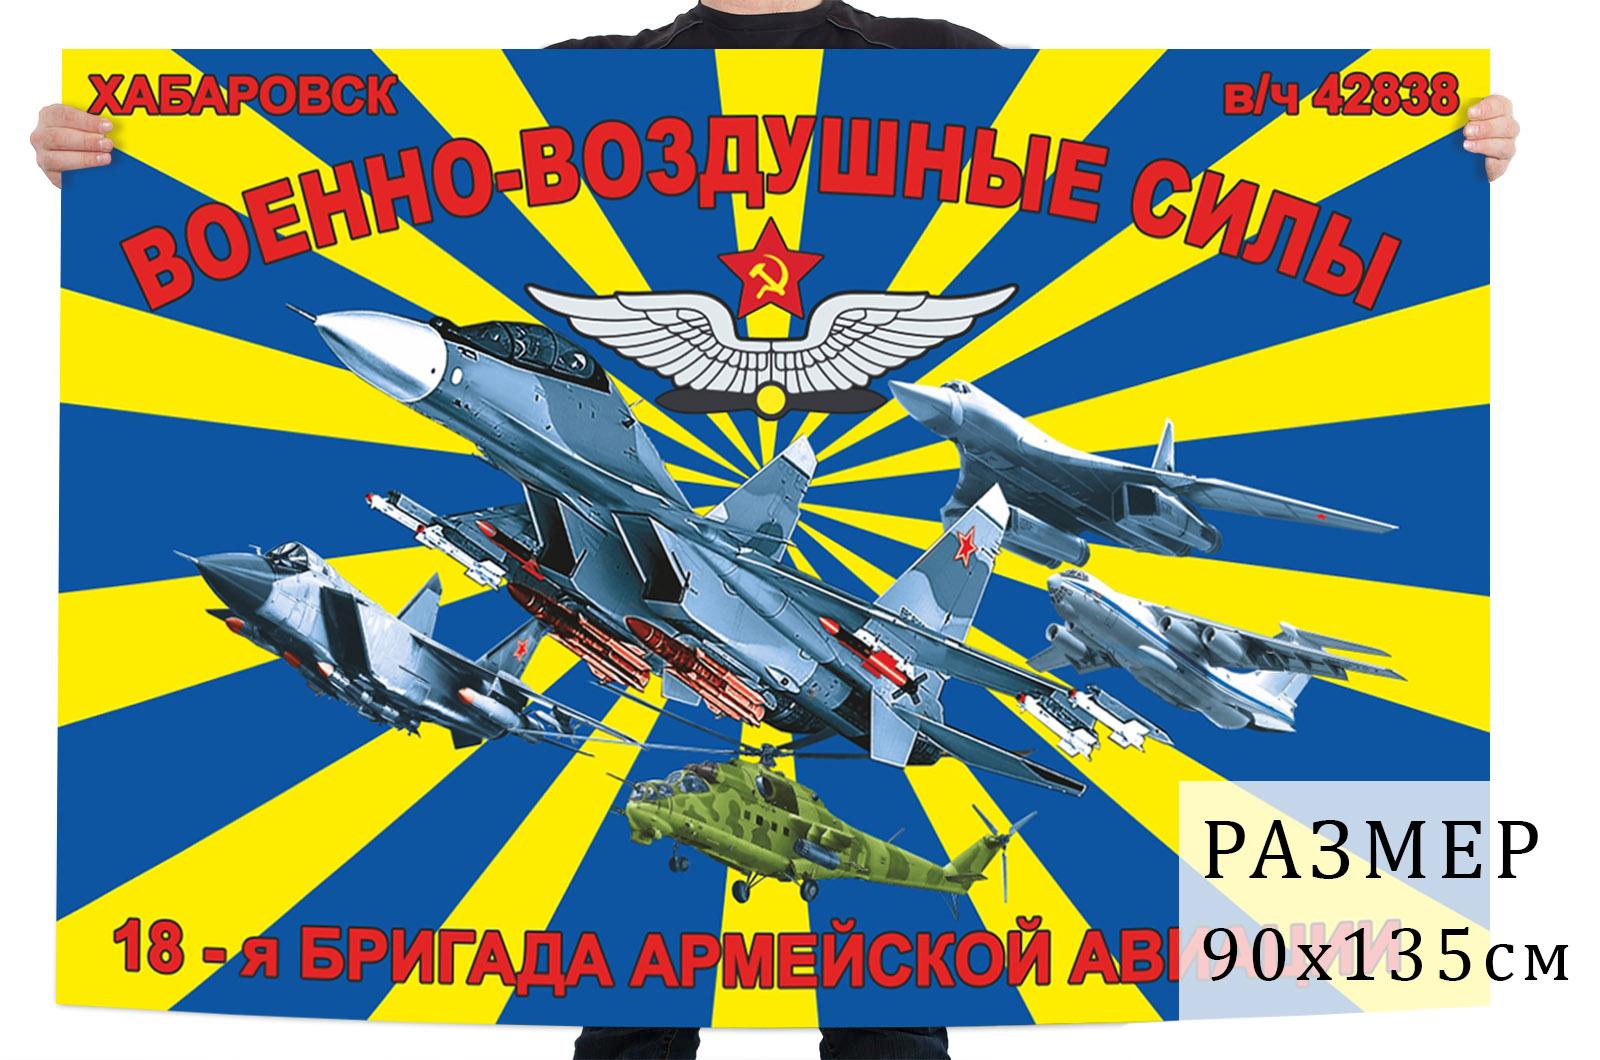 Флаг 18-я бригада армейской авиации ВВС